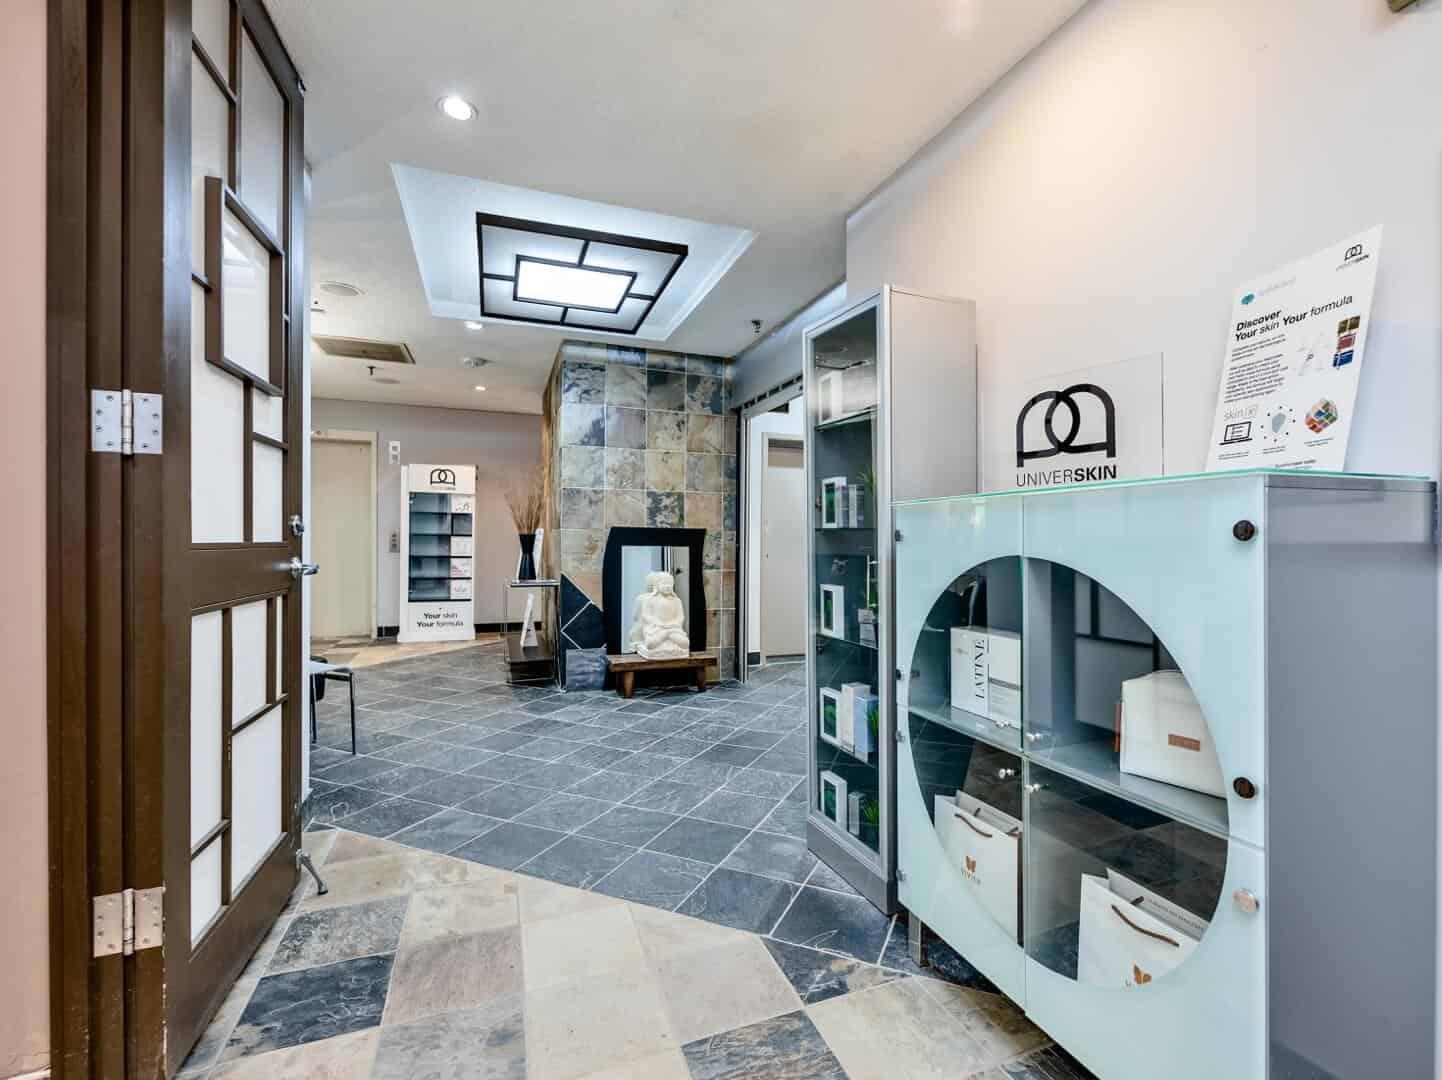 Toronto Plastic Surgeons Clinic Universkin Station